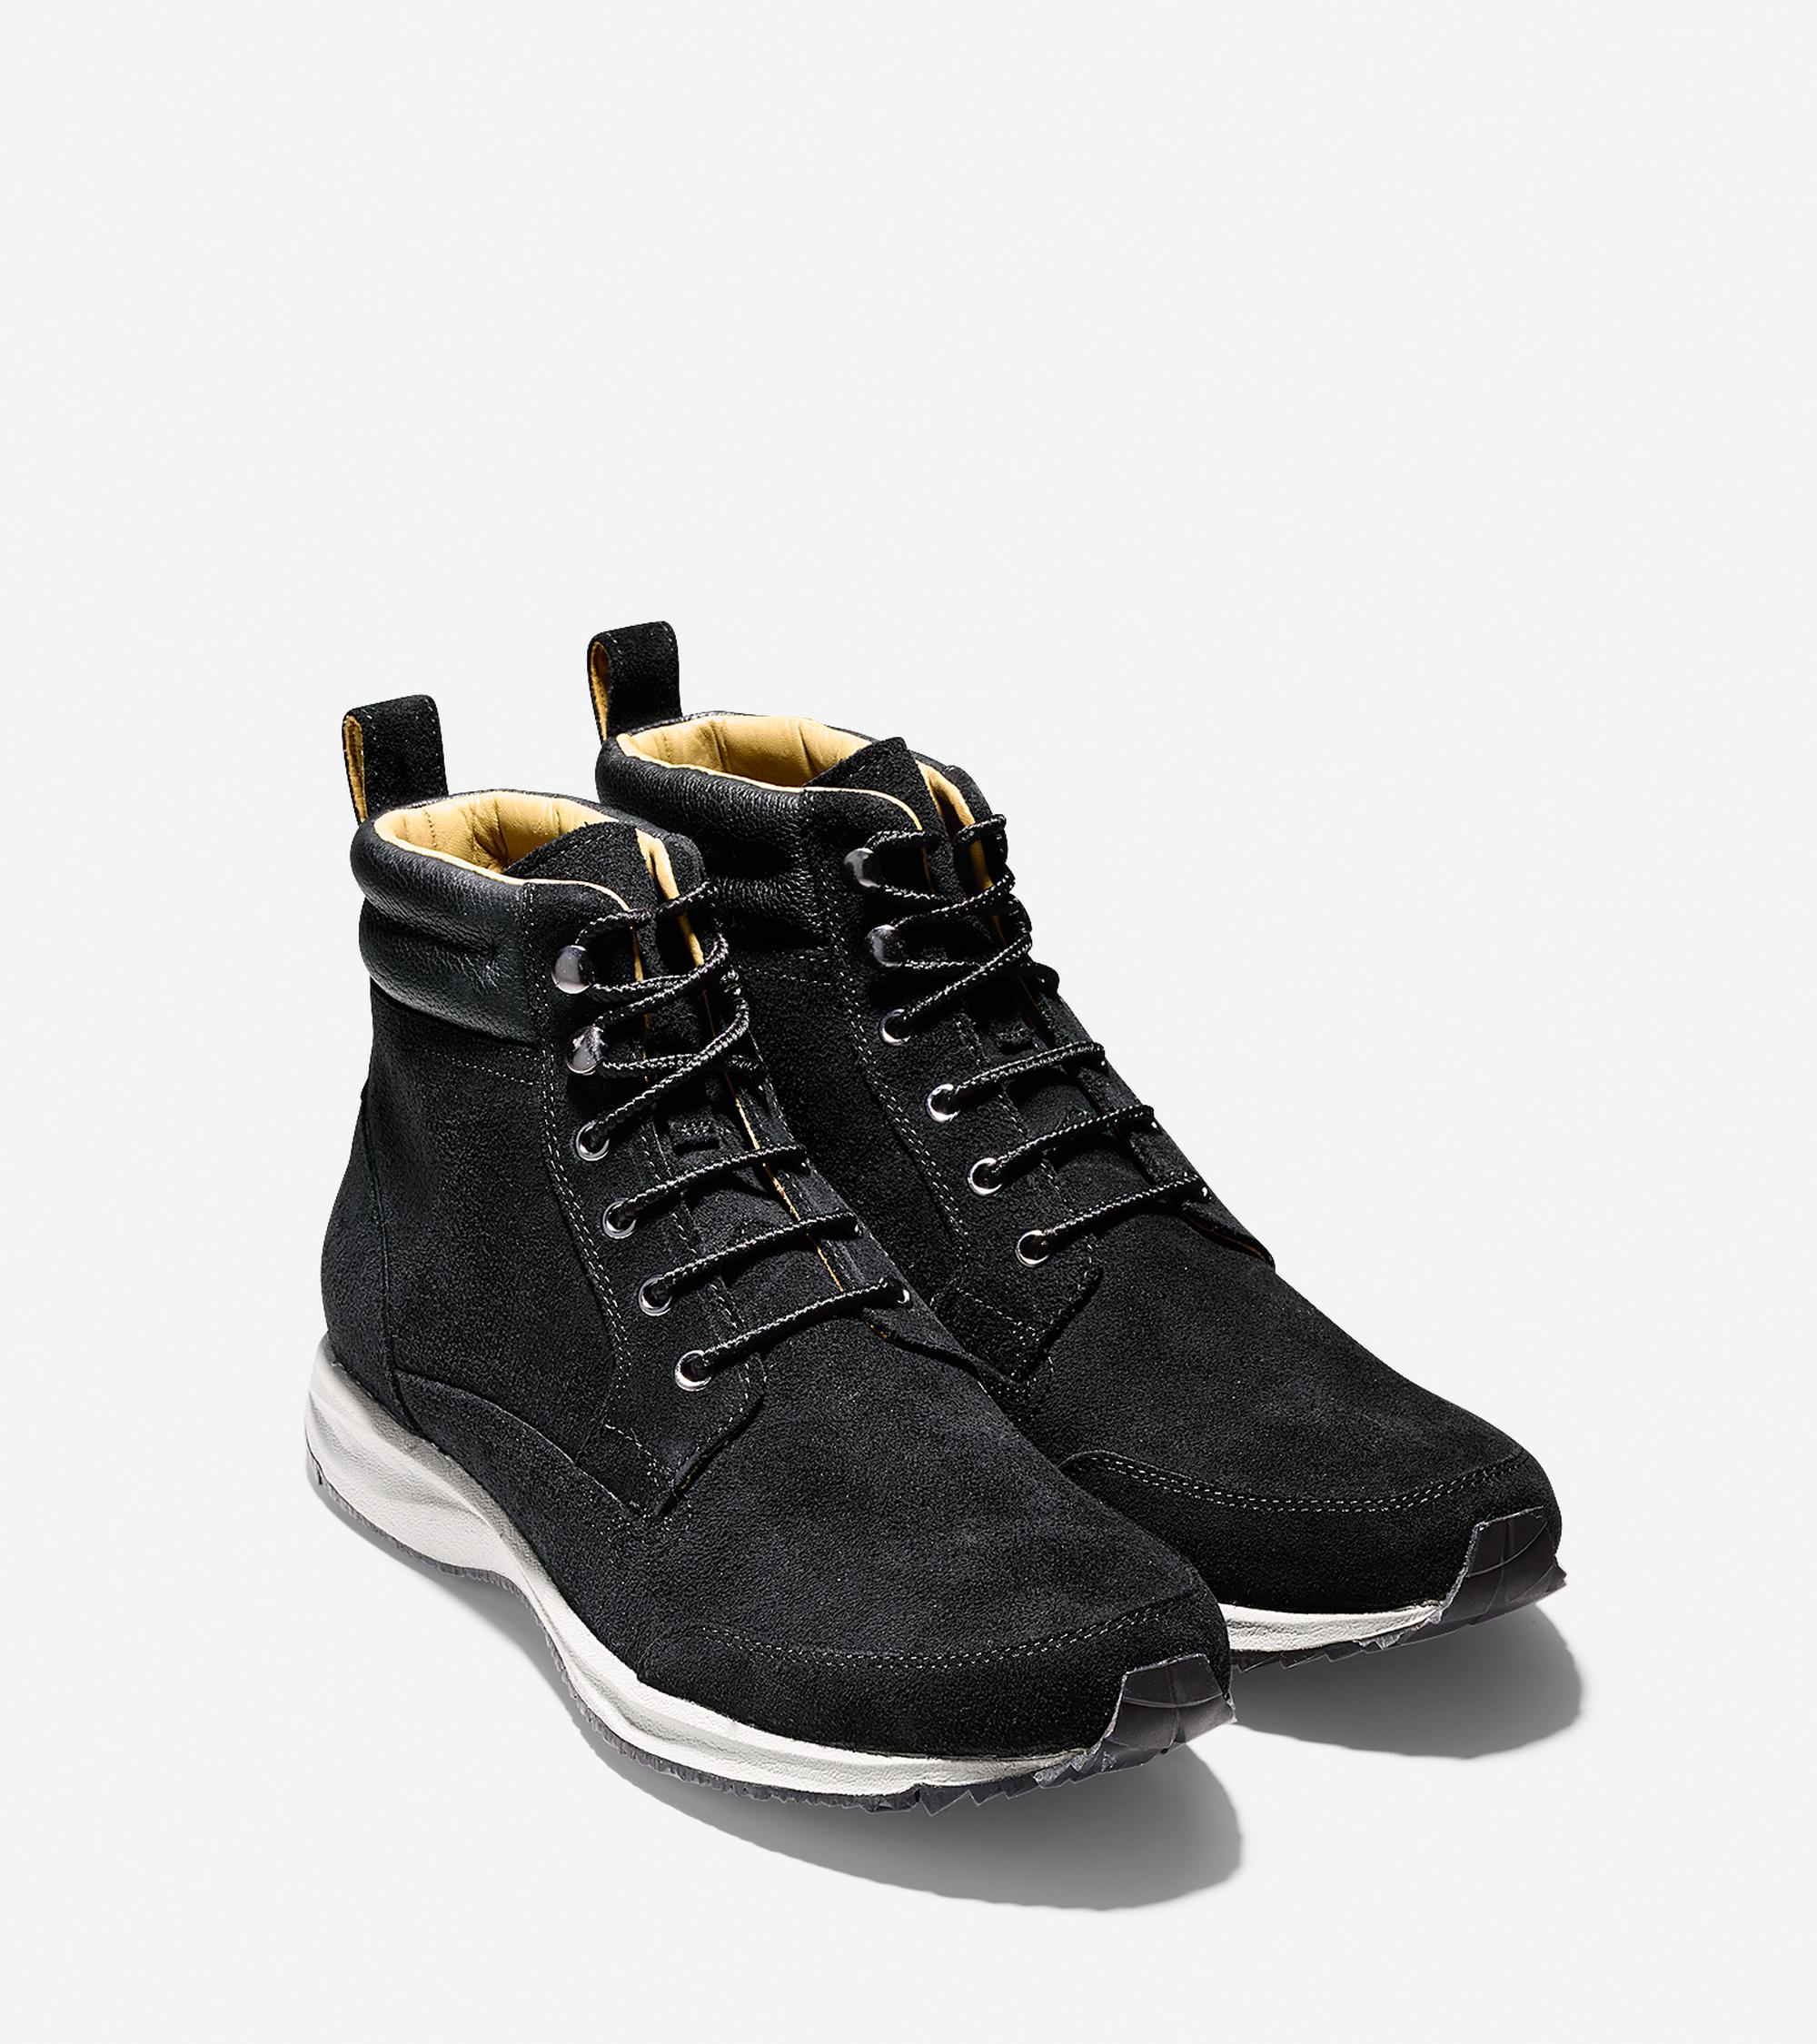 cole haan branson waterproof sneaker boot in black for